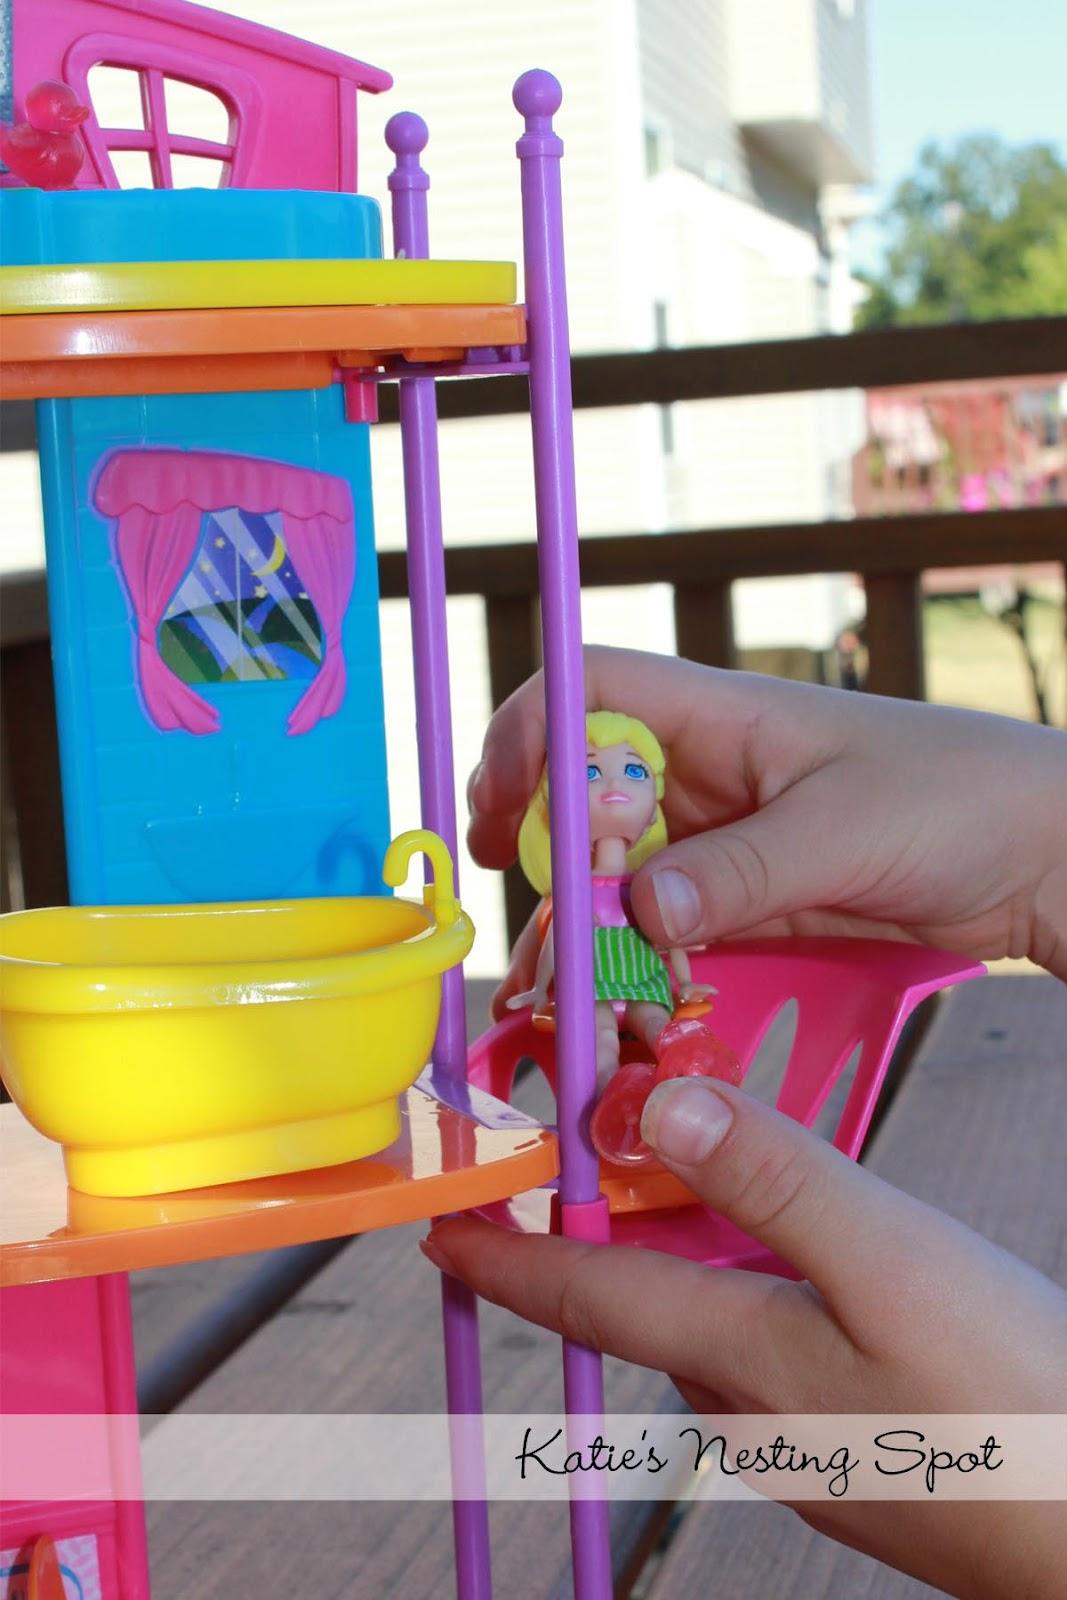 Katie S Nesting Spot Mattel S Polly Pocket Hangout House